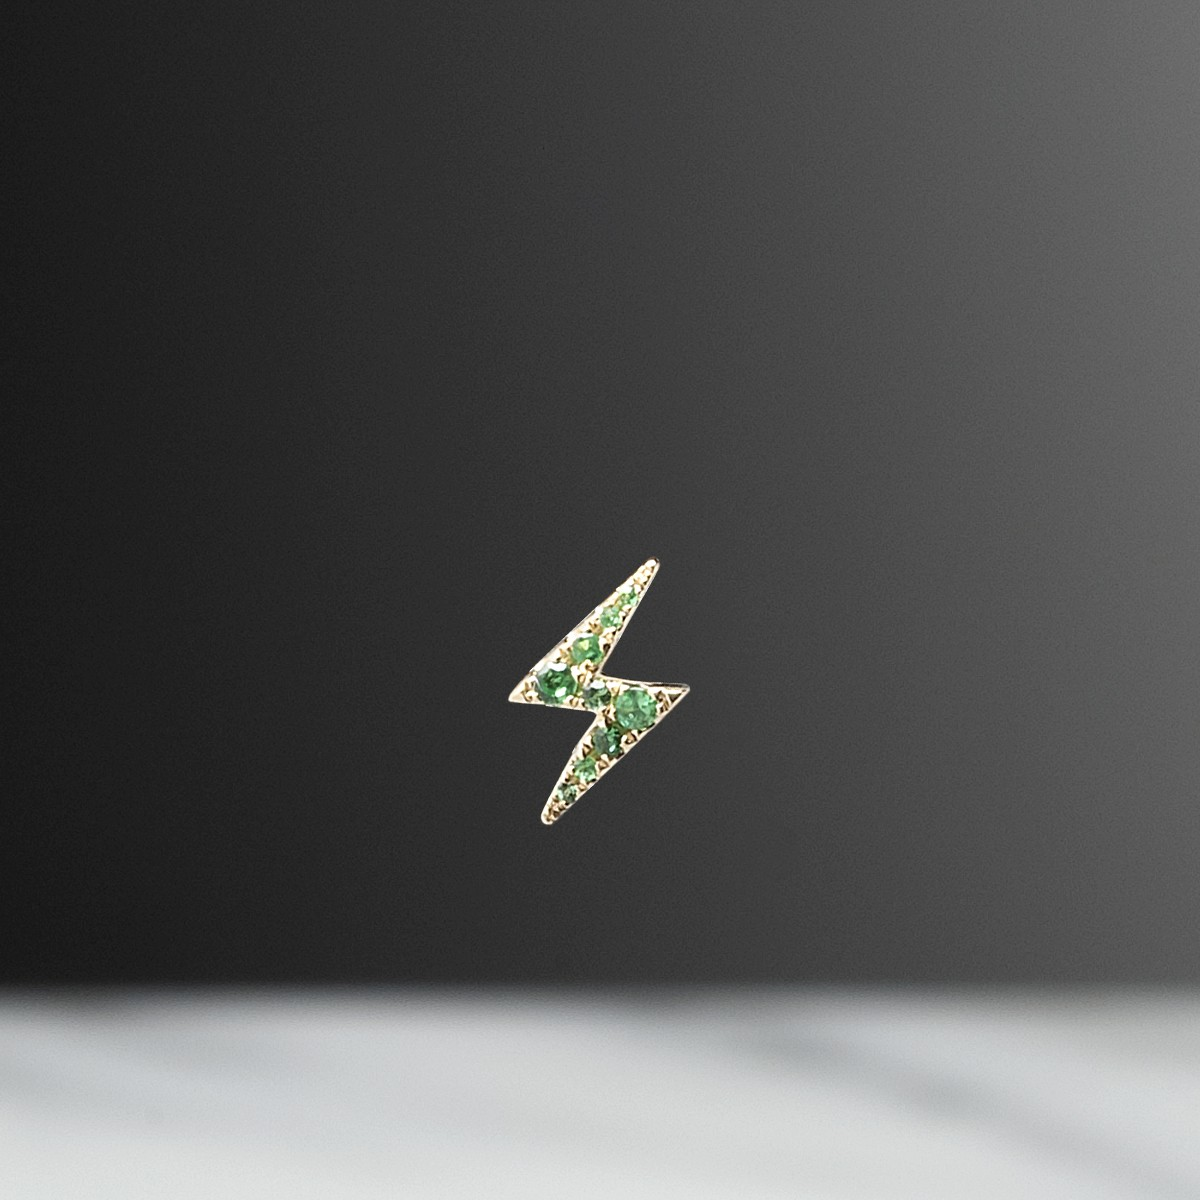 eclair-1960-or-jaune-grenat-vert